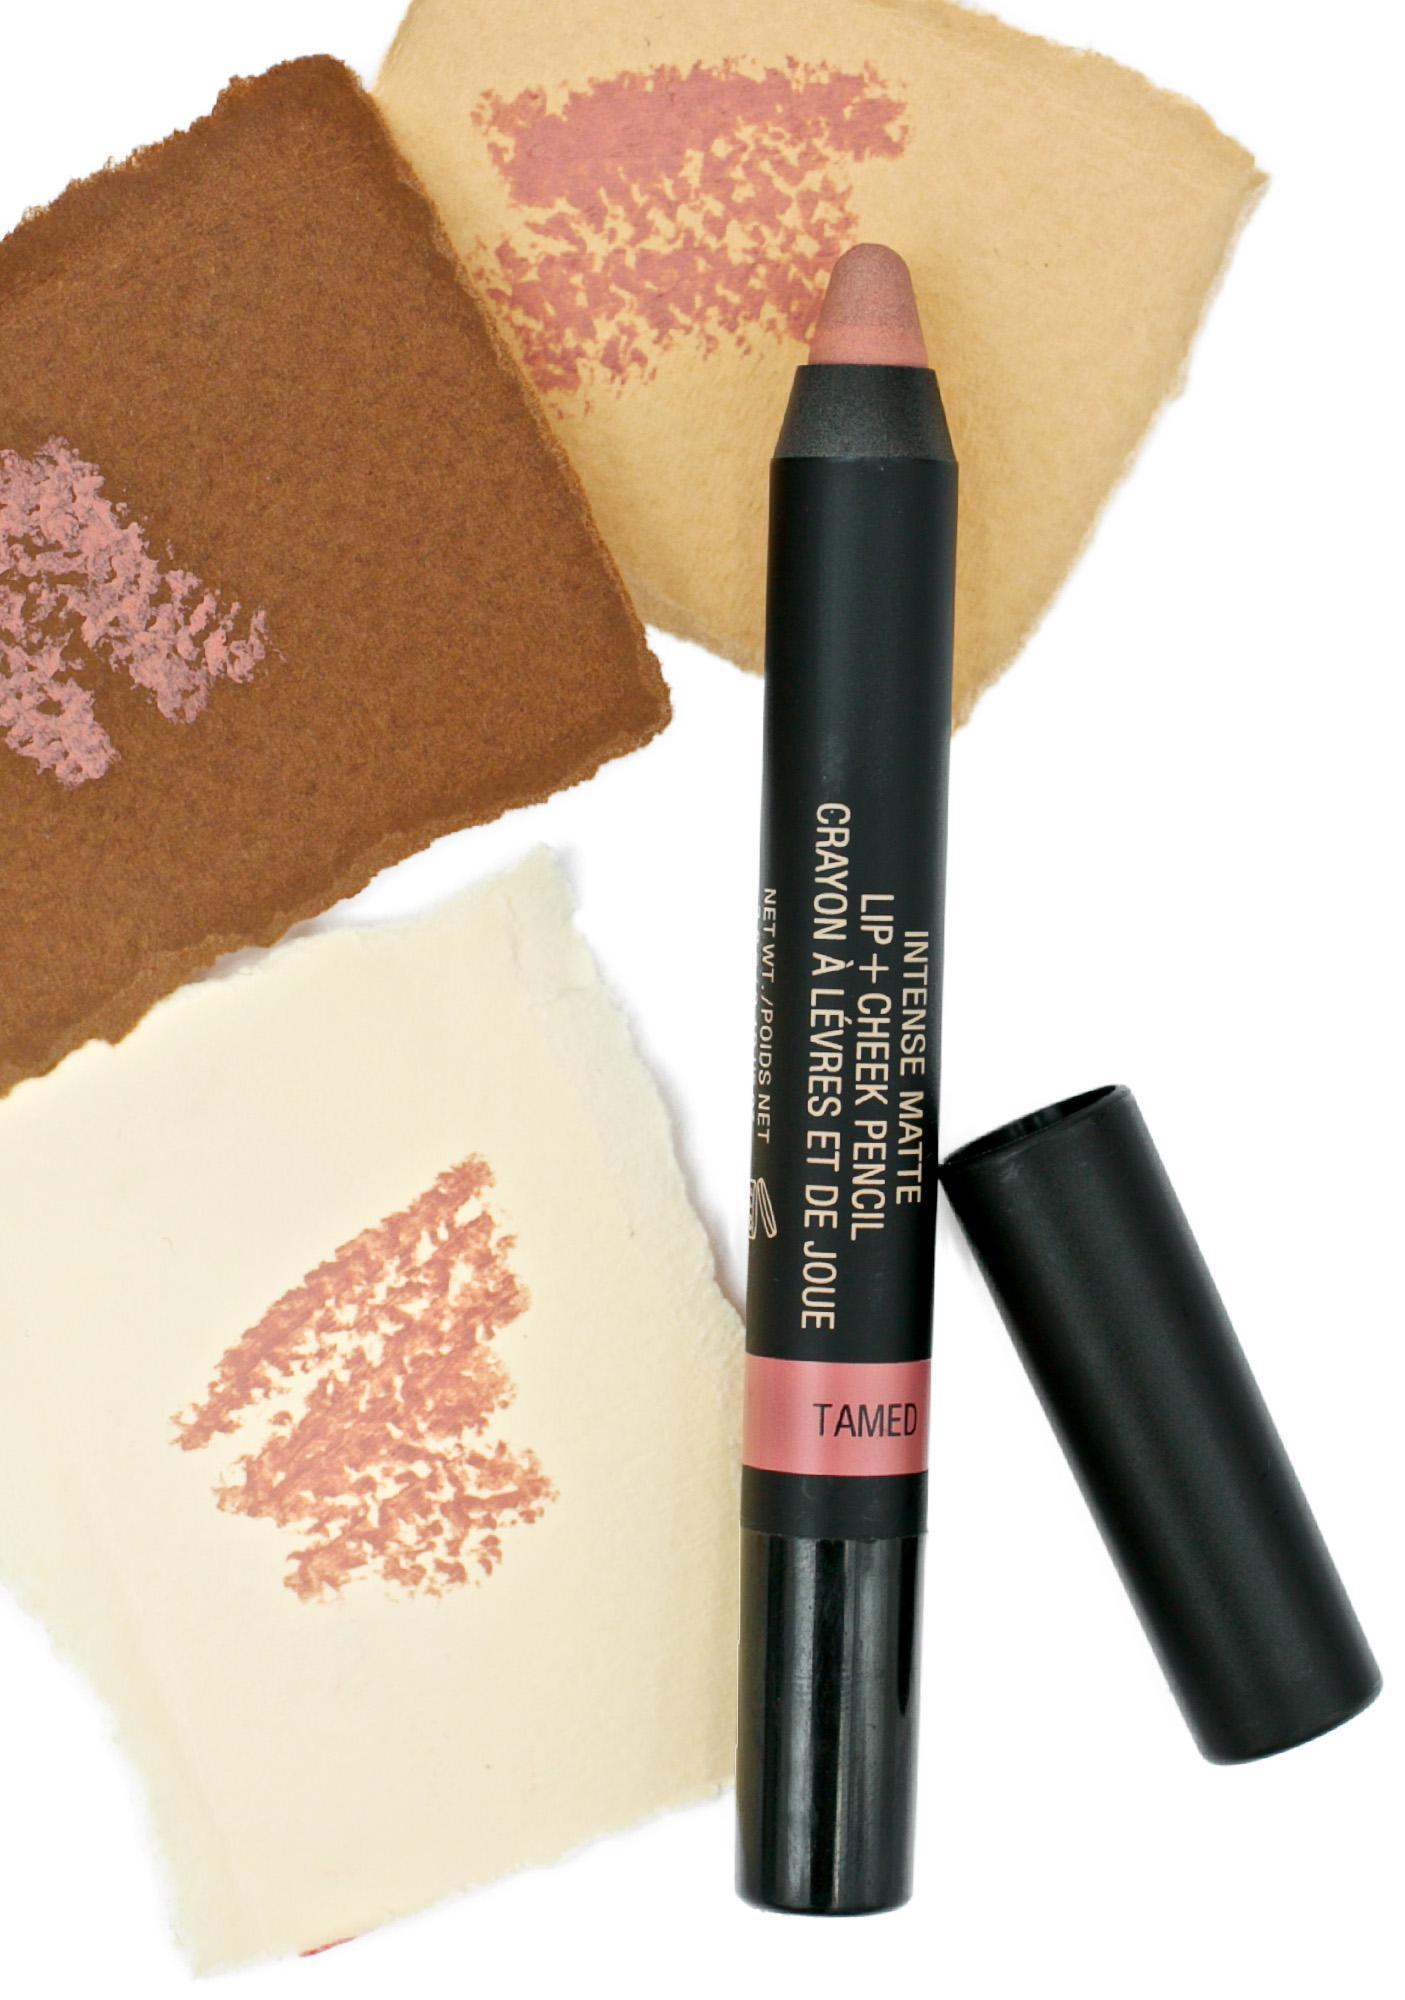 Nudestix Tamed Matte Lip + Cheek Pencil